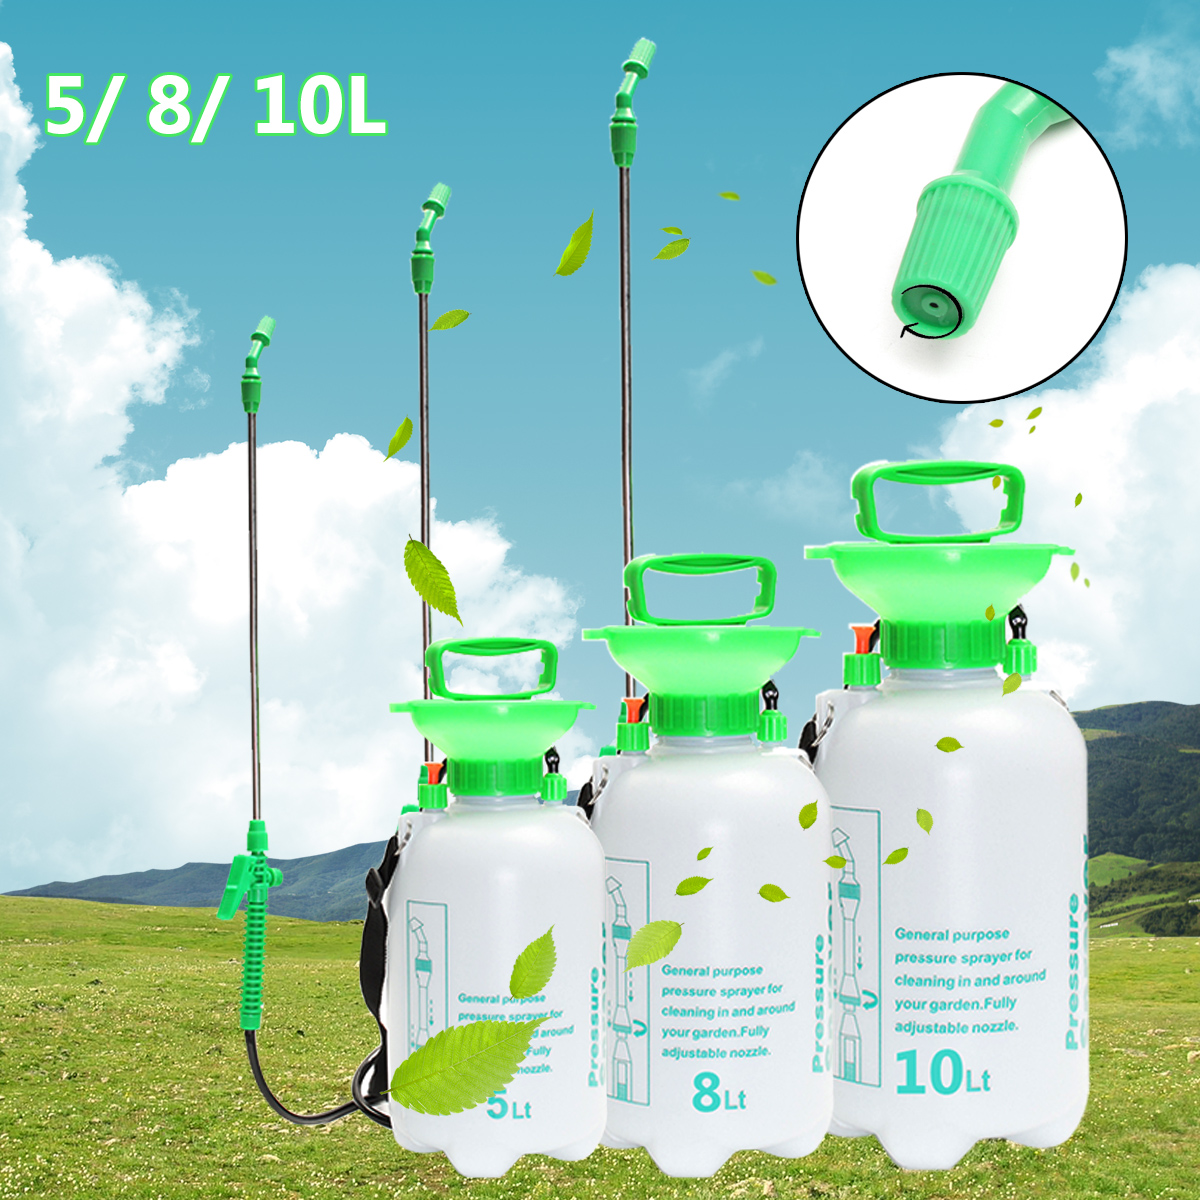 5/10L Garden Water Pressure Sprayer Manual Bottle Knapsack Watering Equipment Weed Killer Plants